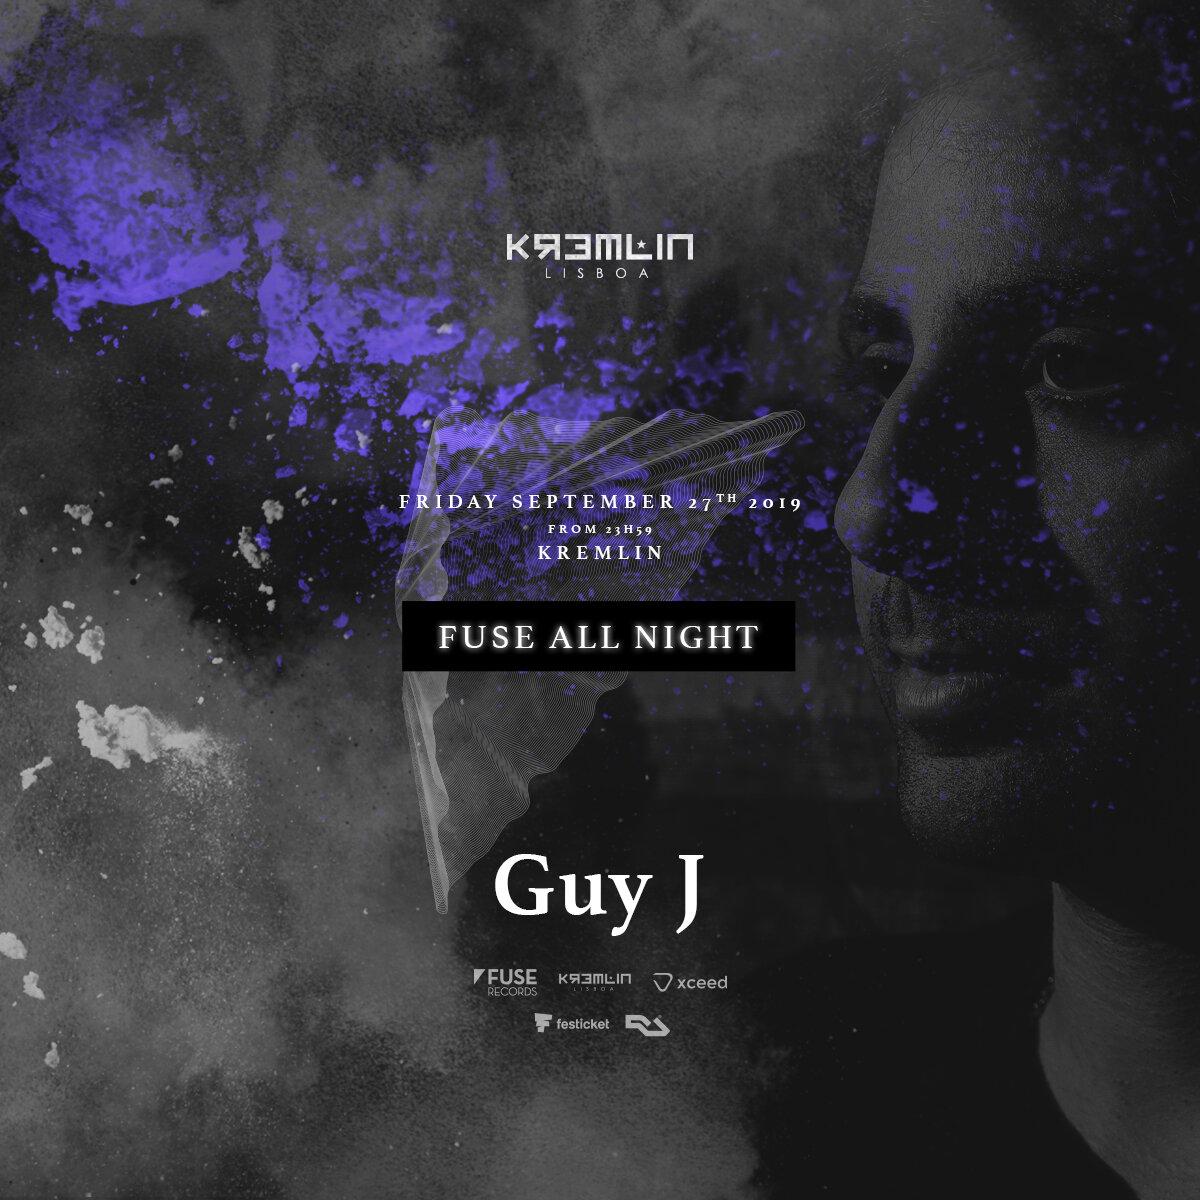 AllNight_27092019_Profile_GuyJ.jpg